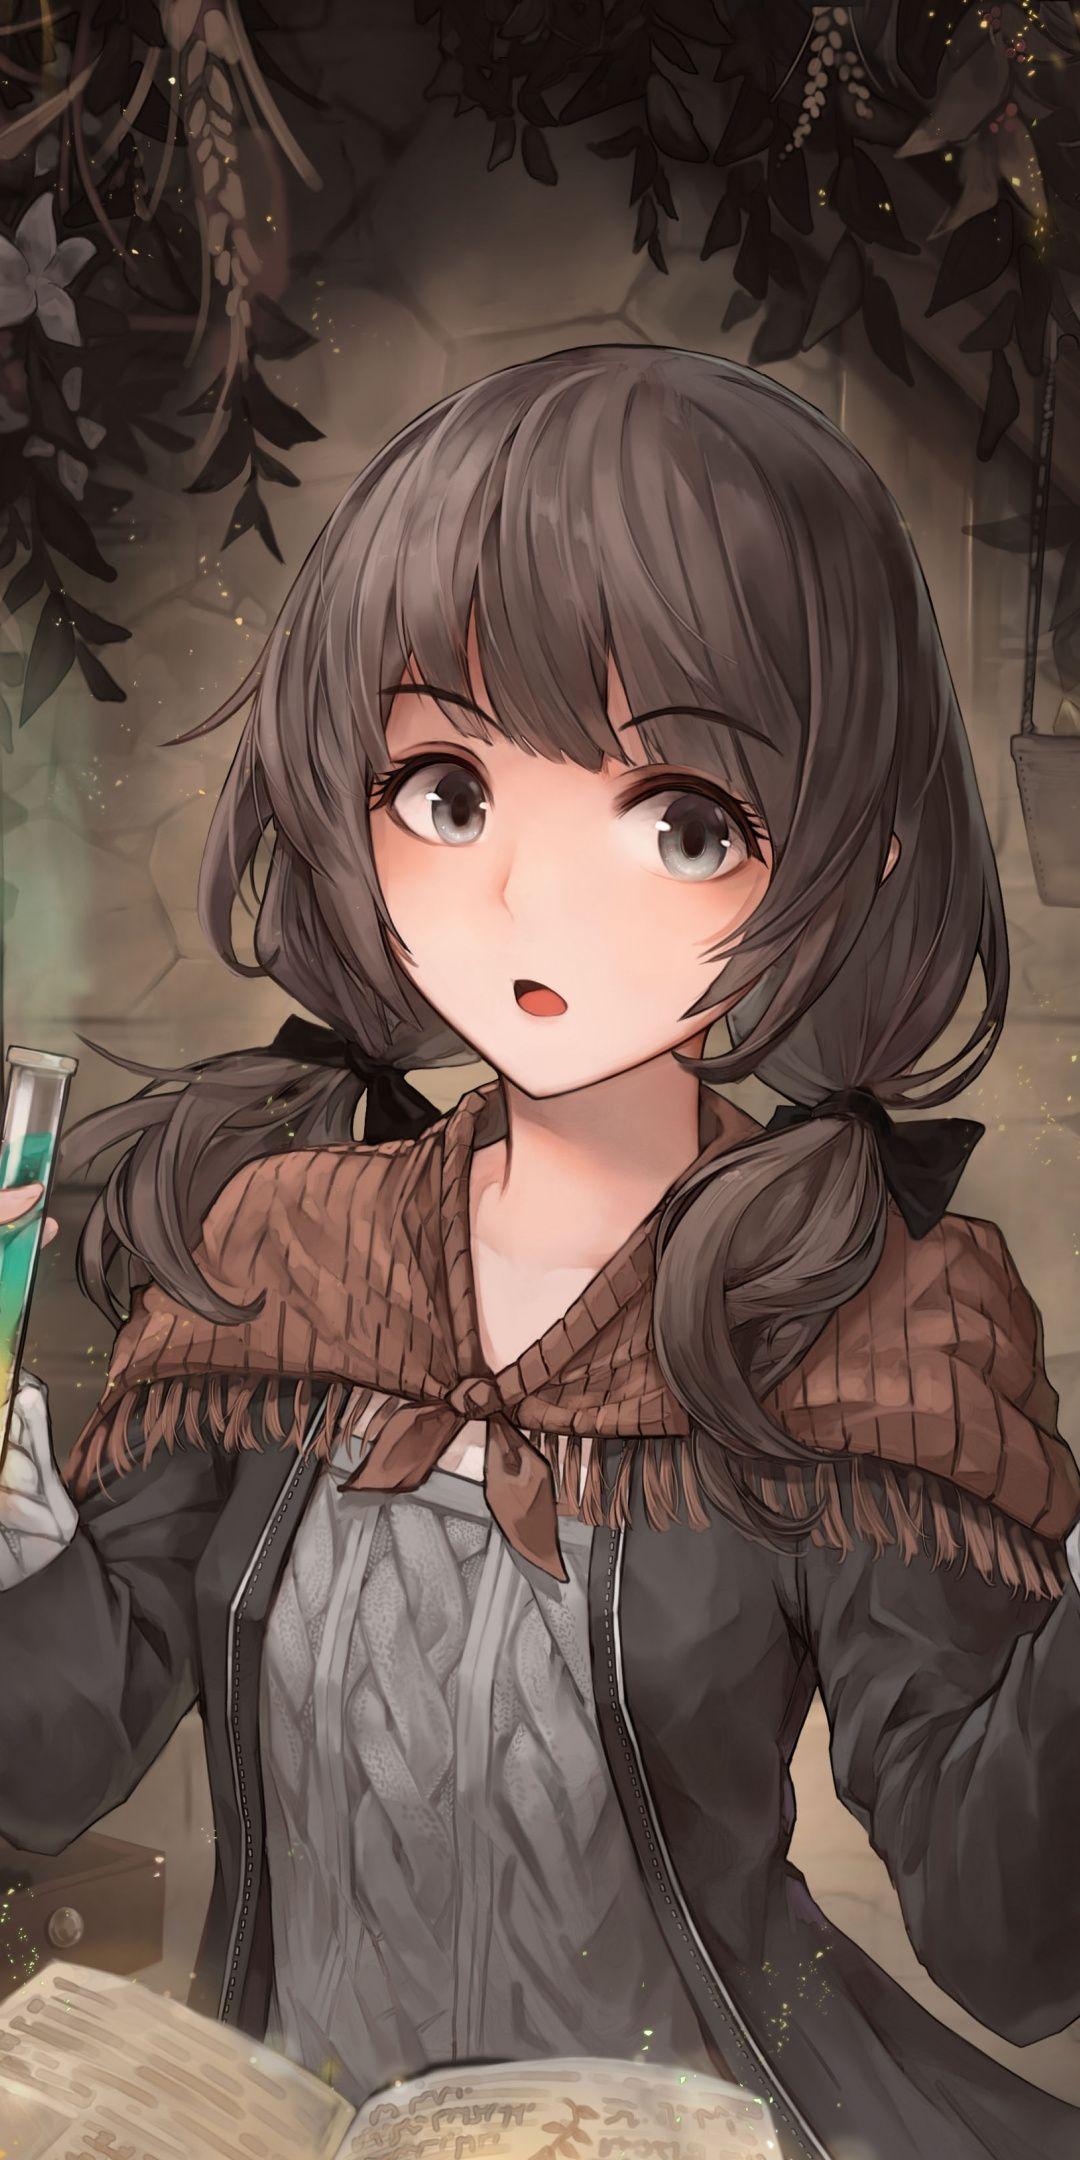 Curious Wizard Fantasy Anime Girl Art 1080x2160